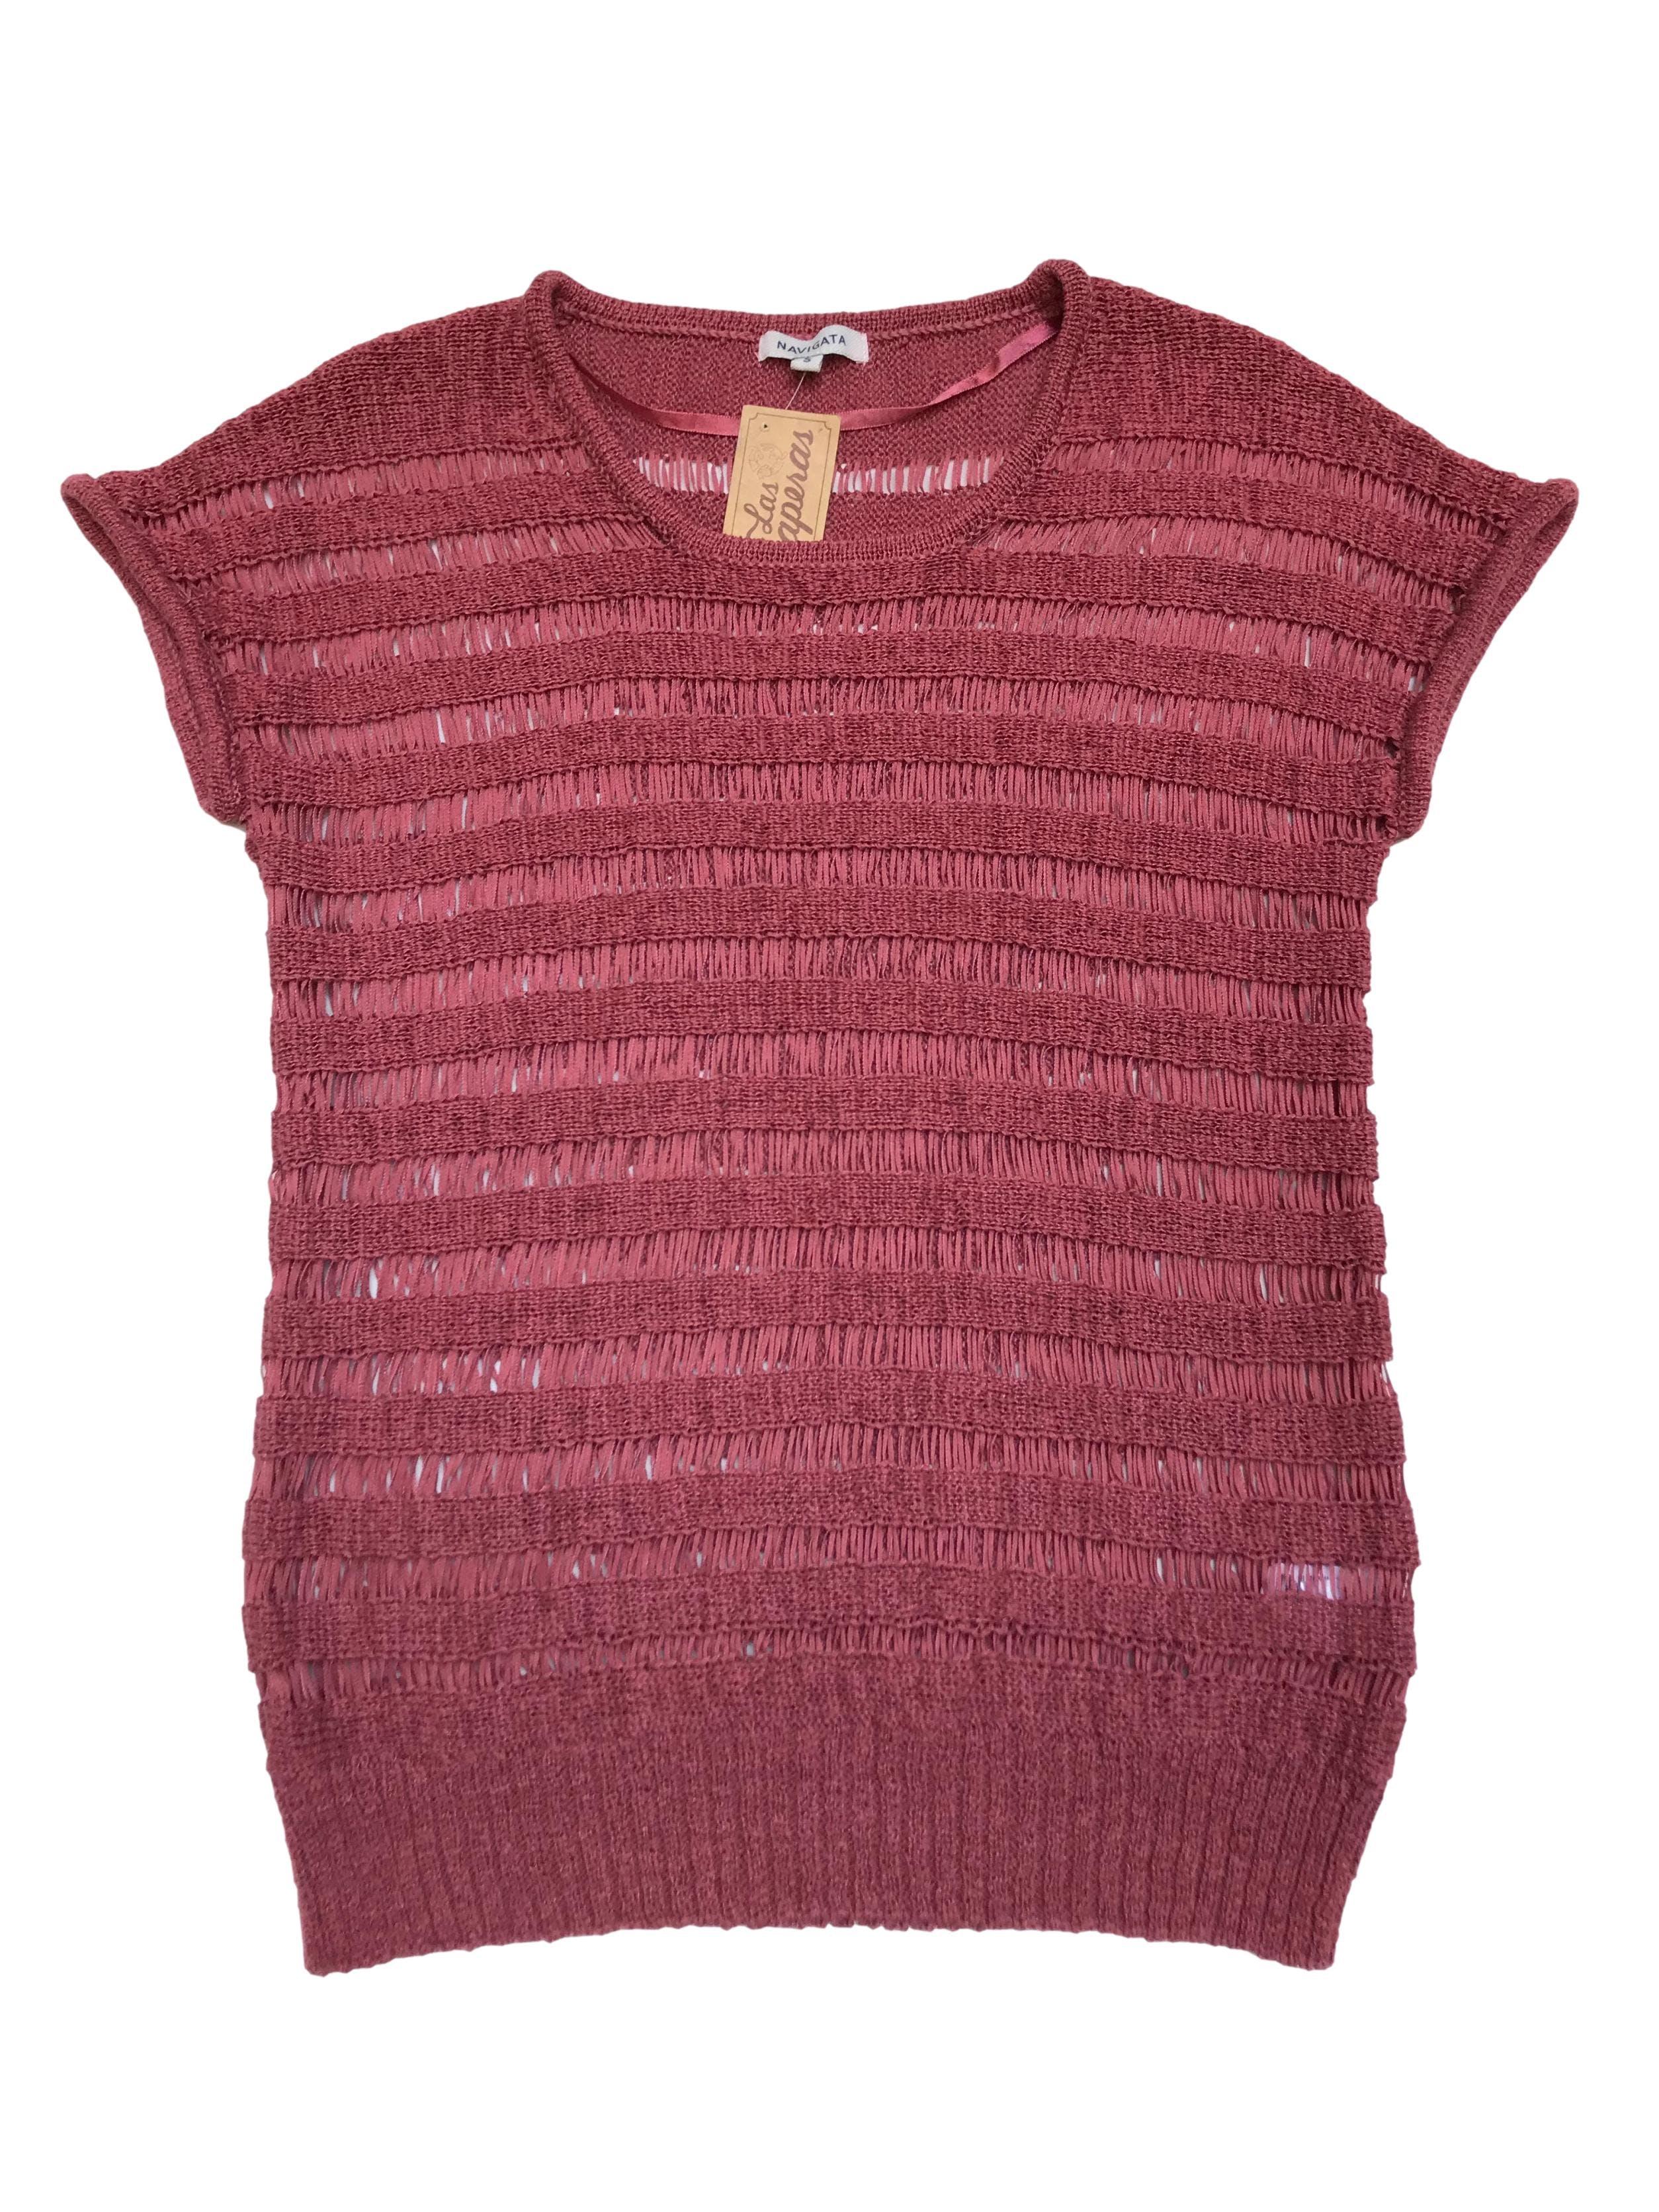 Sweater Navigata tejido en dos puntos con franjas caladas